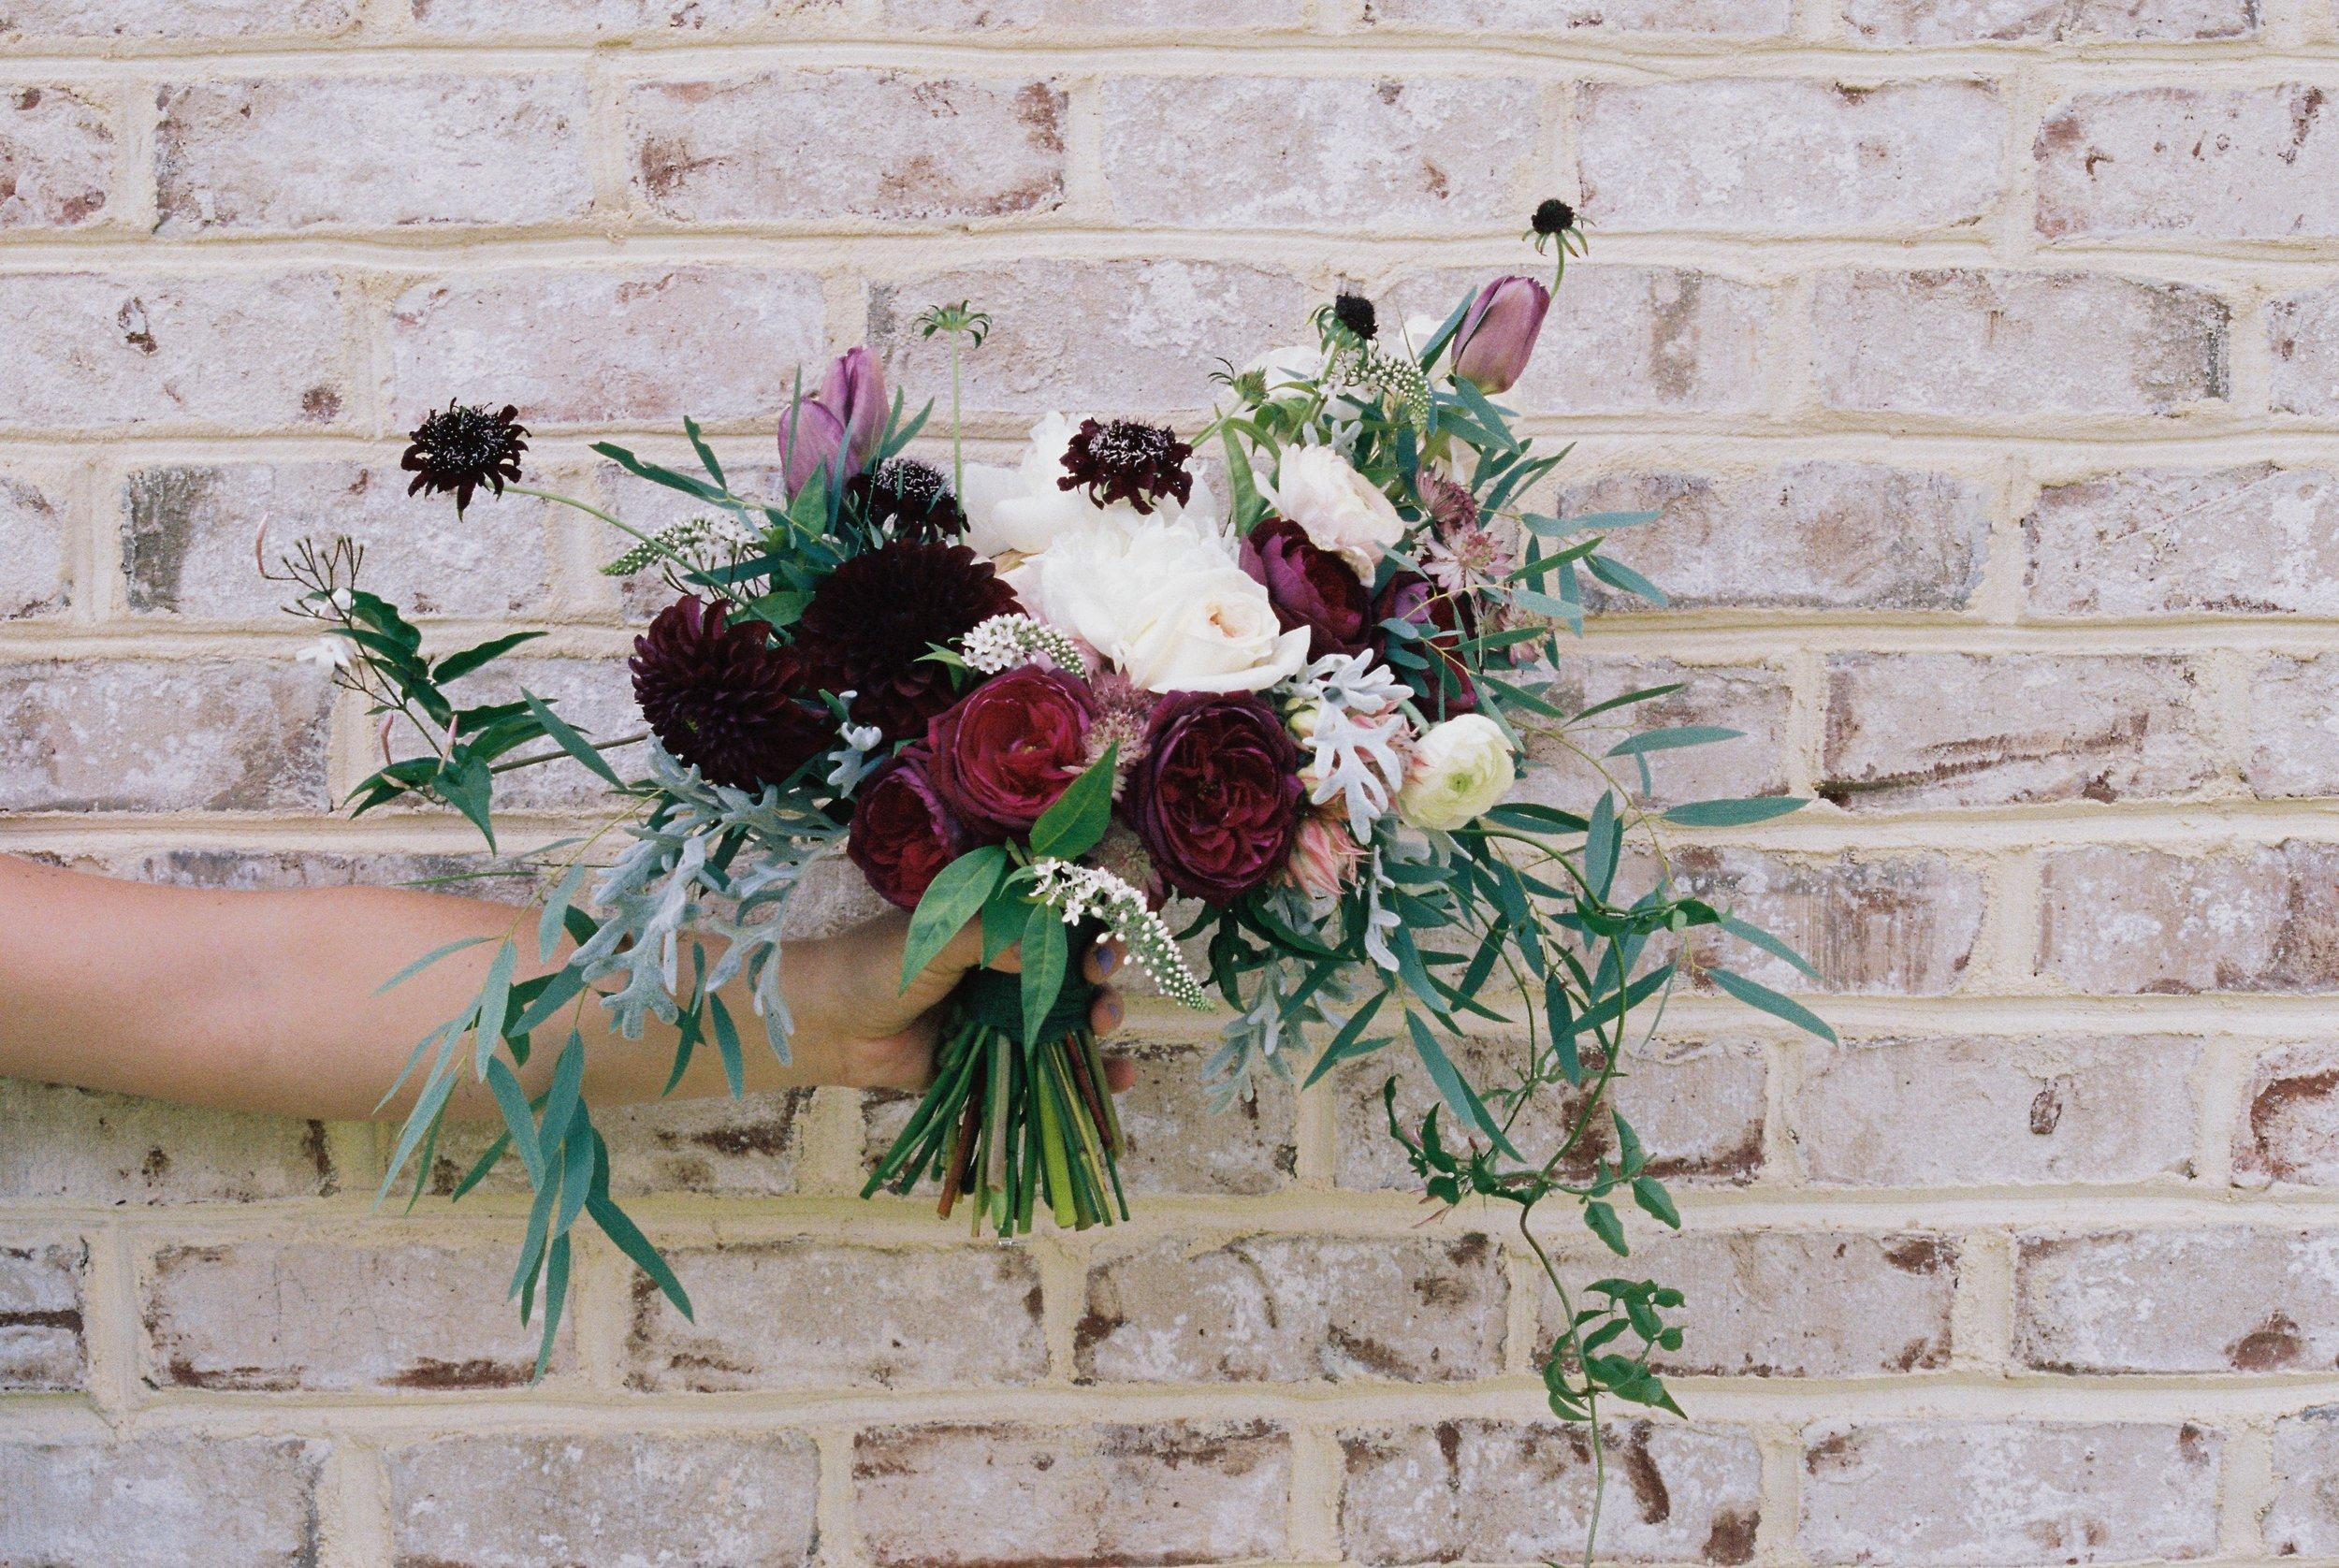 bouquet-bunch-of-flowers-flowers-wedding-planning